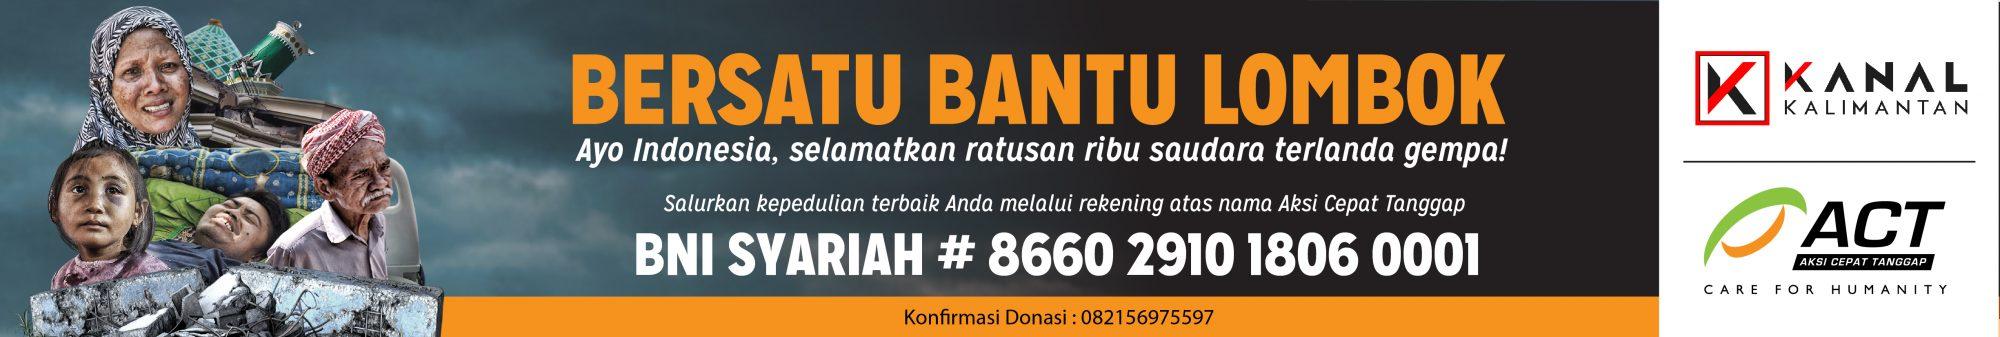 Posdig Gempa Lombok Resize 1176×198 pixels 3-01-01-01